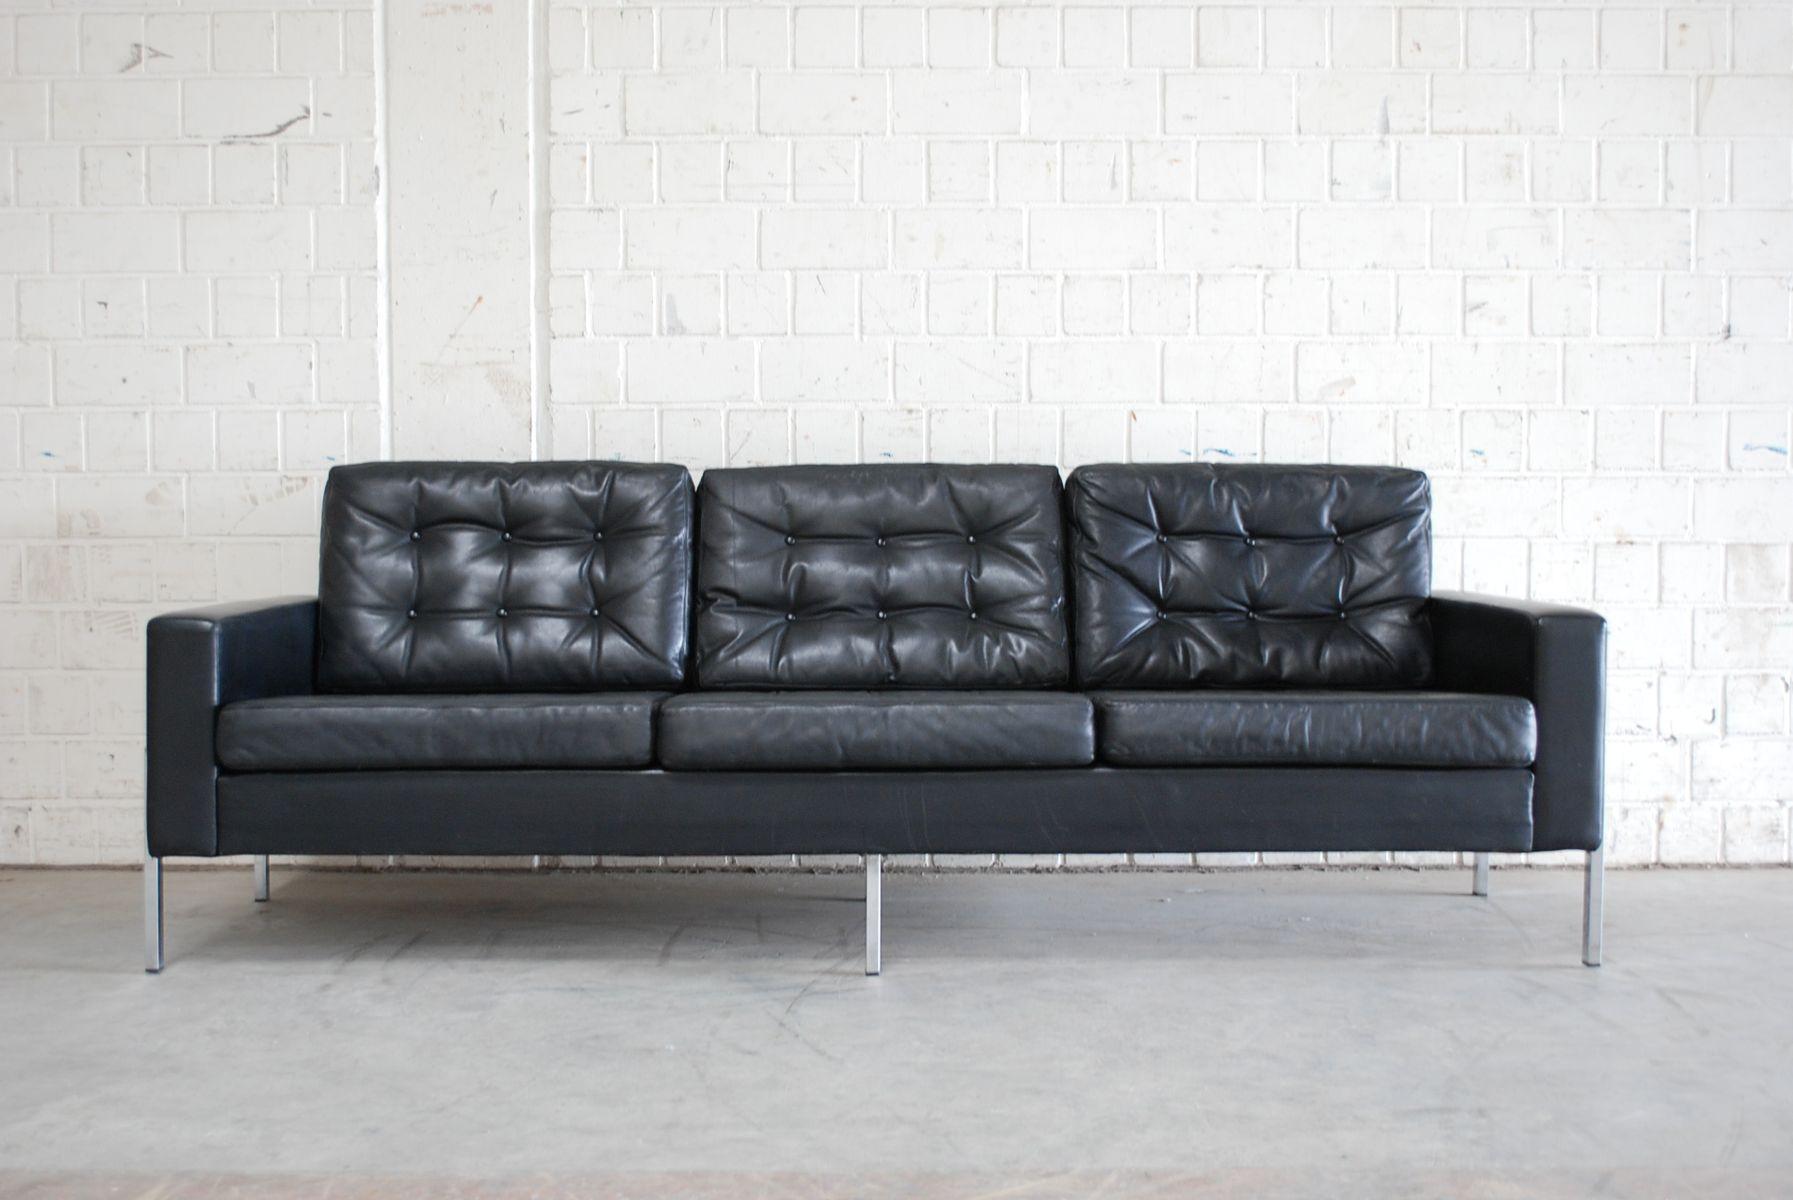 Vintage German Black Leather Sofa 1960s for sale at Pamono